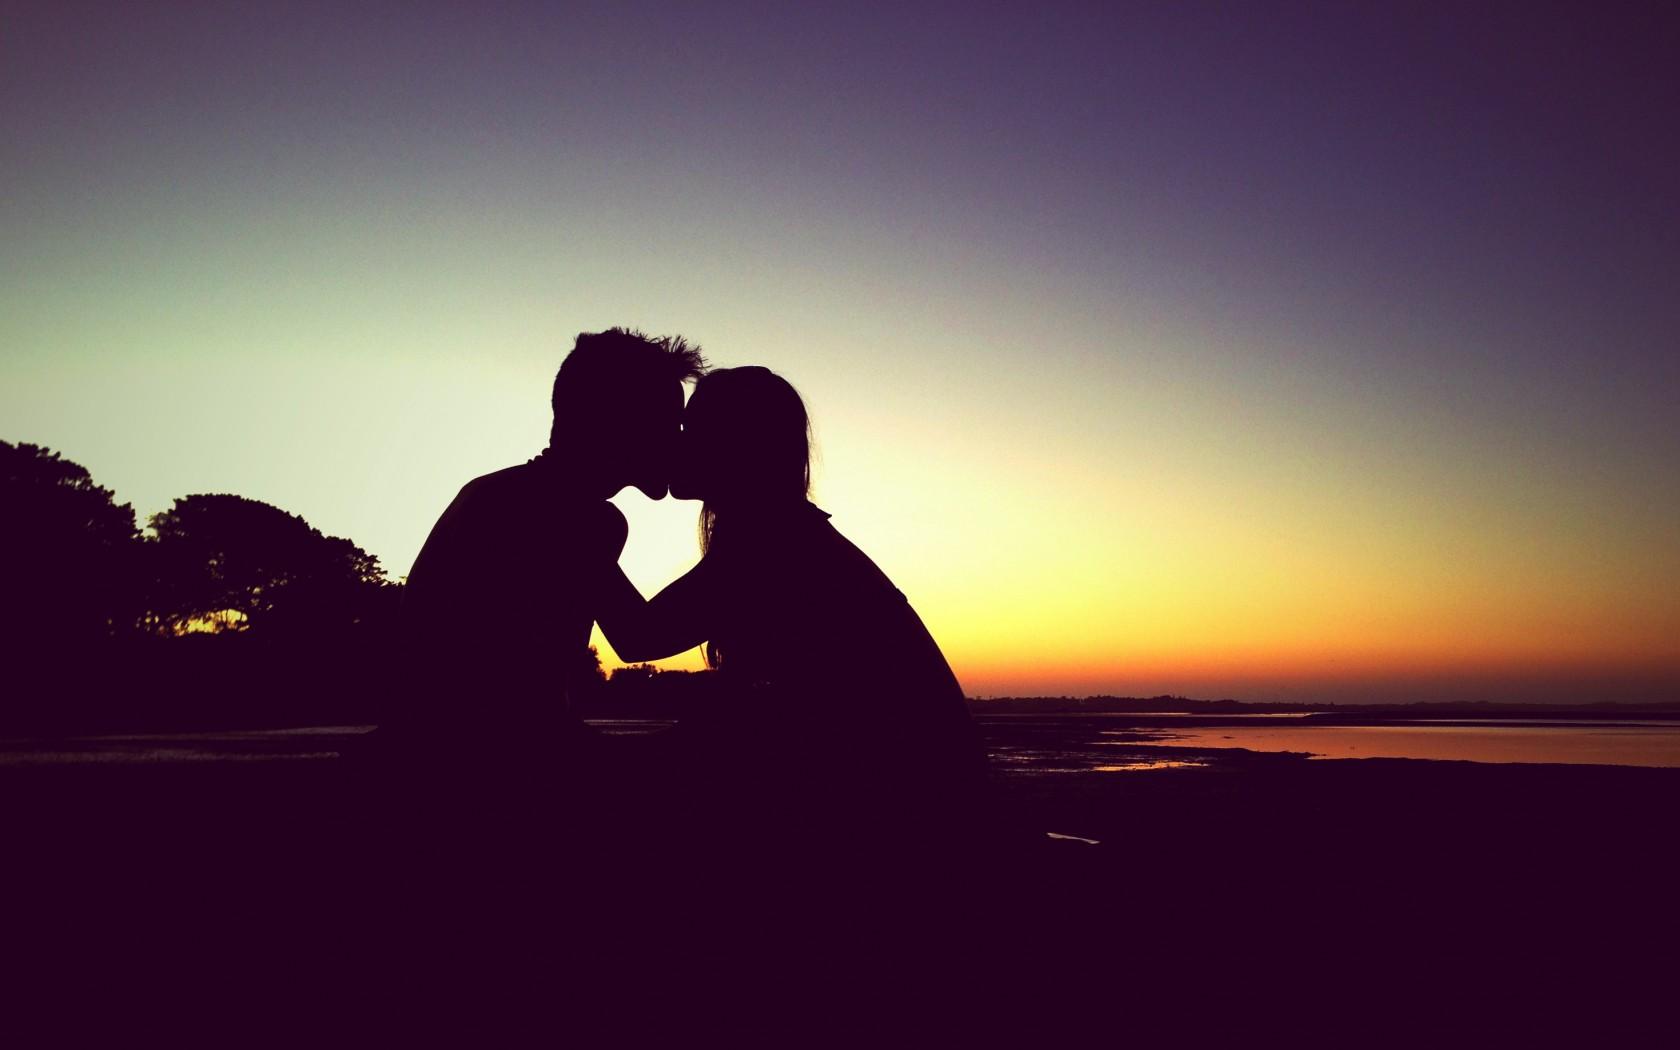 Love Kiss Wallpaper Romantic Hd 441974 Hd Wallpaper